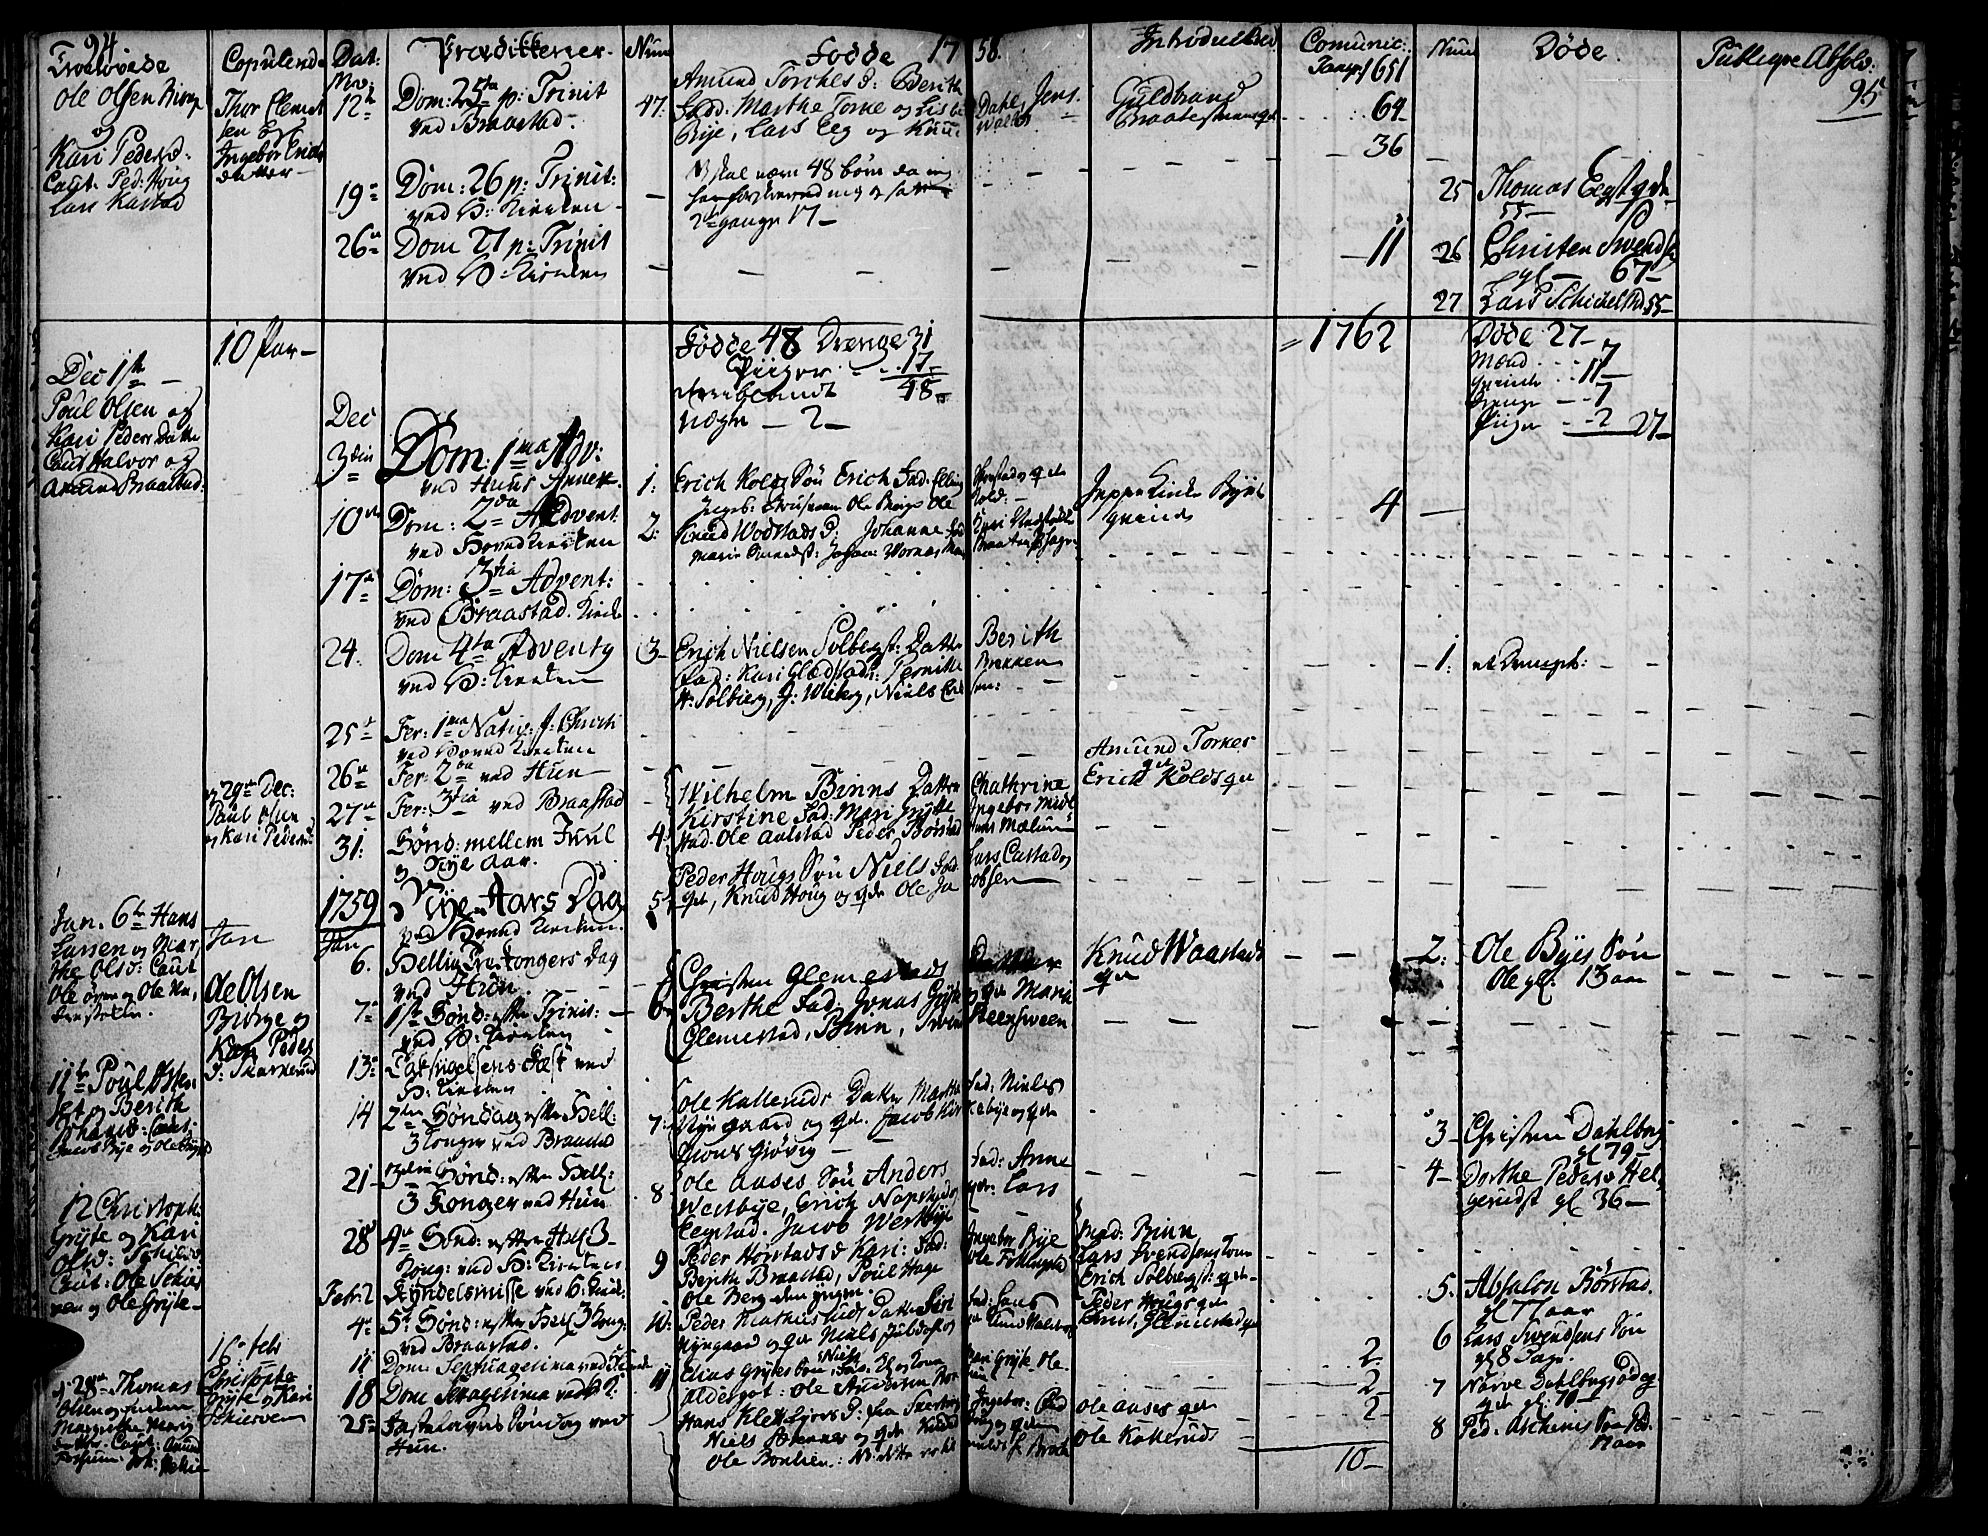 SAH, Vardal prestekontor, H/Ha/Haa/L0002: Ministerialbok nr. 2, 1748-1776, s. 94-95